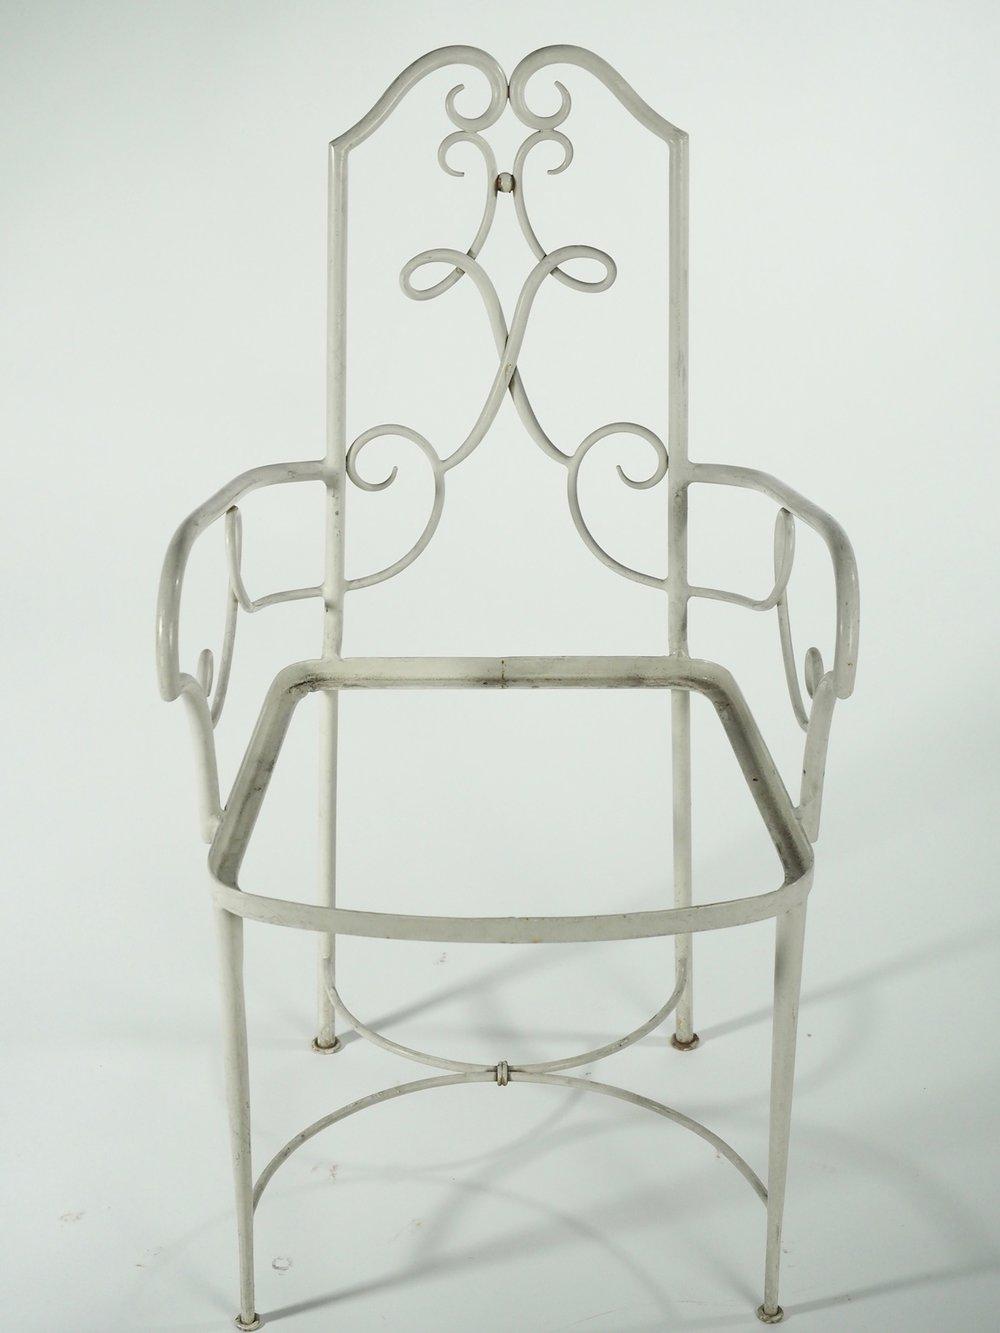 Rene+Prou+4+arms+4+sides+original+white+metal+chairs+400.jpg